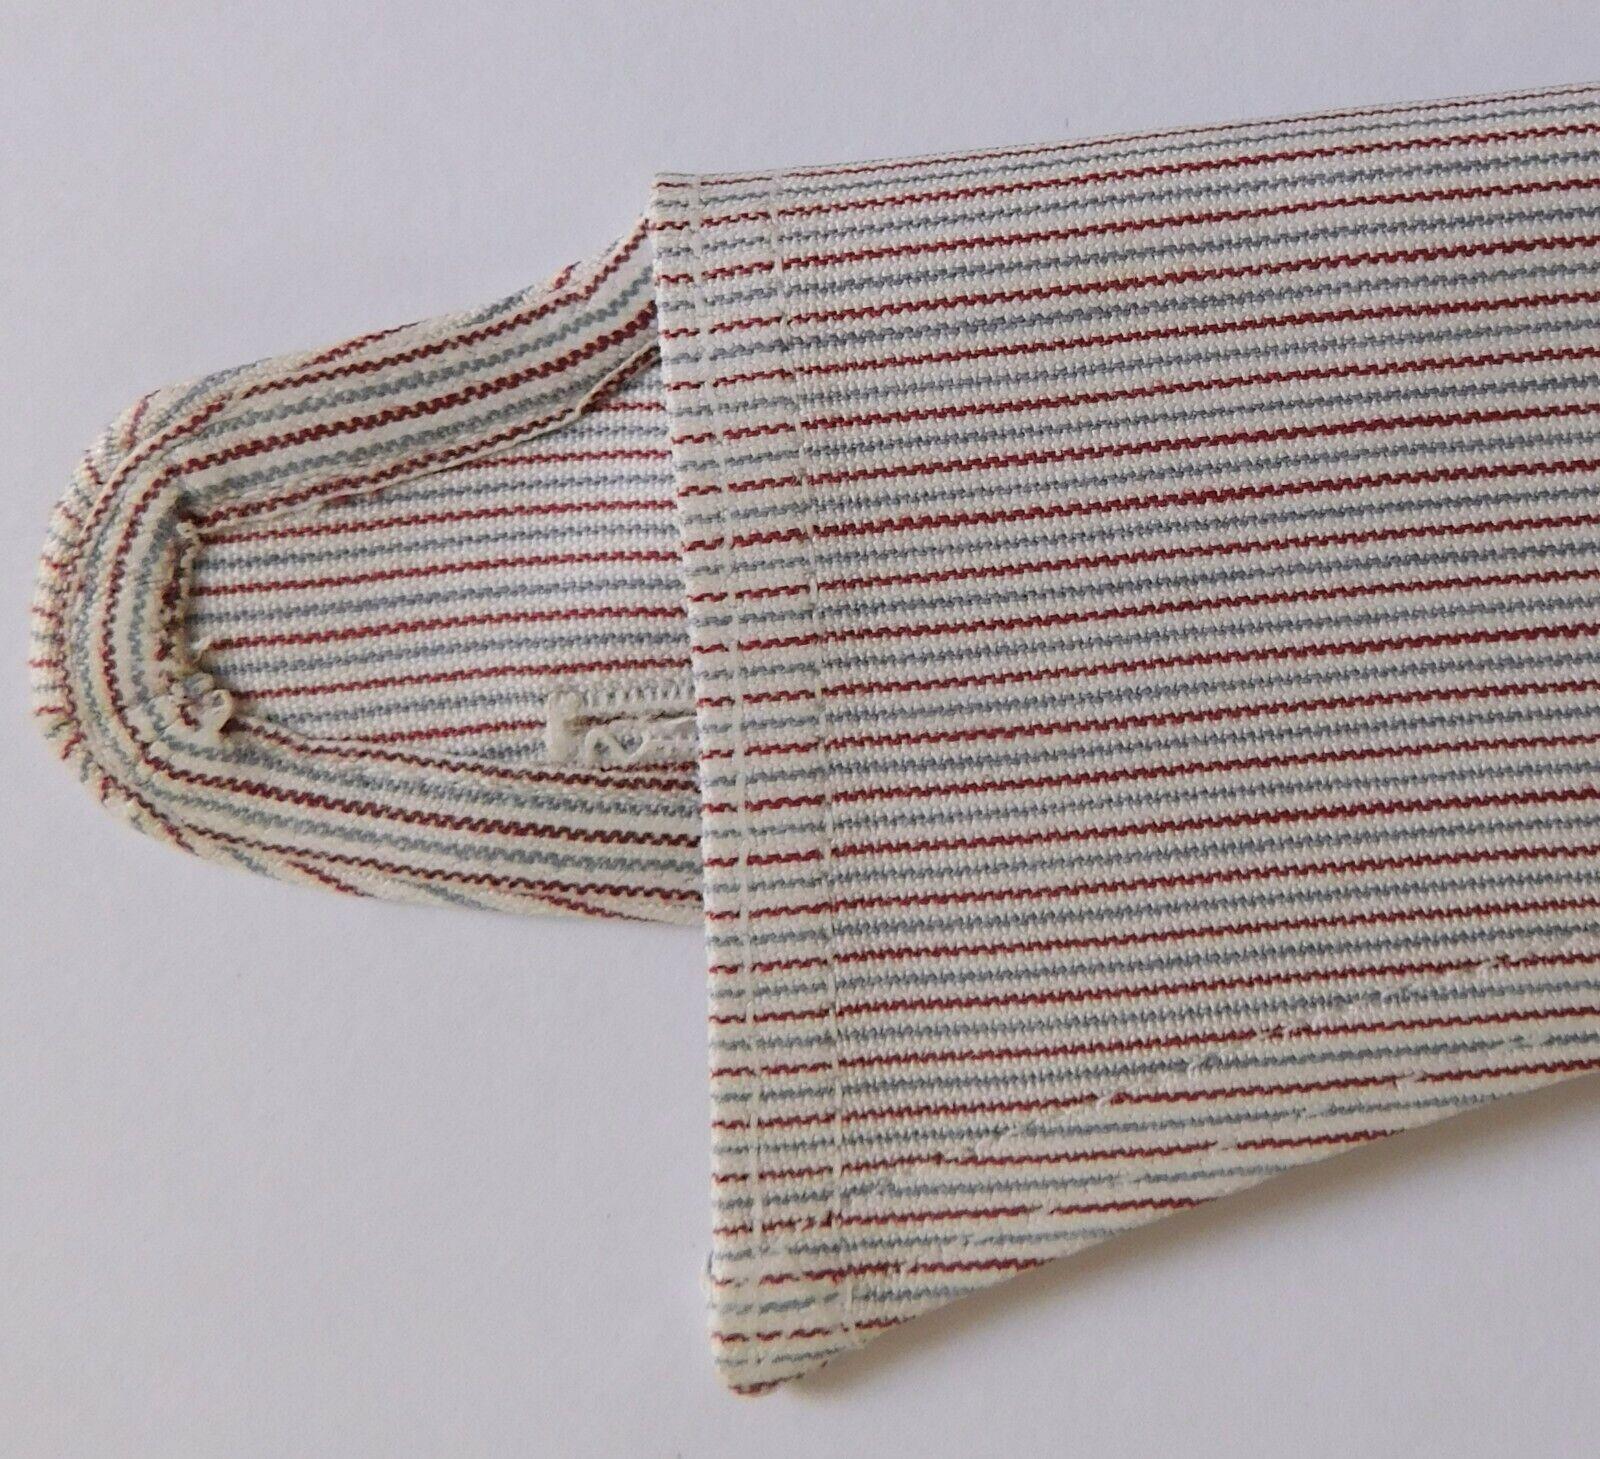 Vintage striped shirt collar size 18 Radiac Rex UNUSED detachable semi-stiff